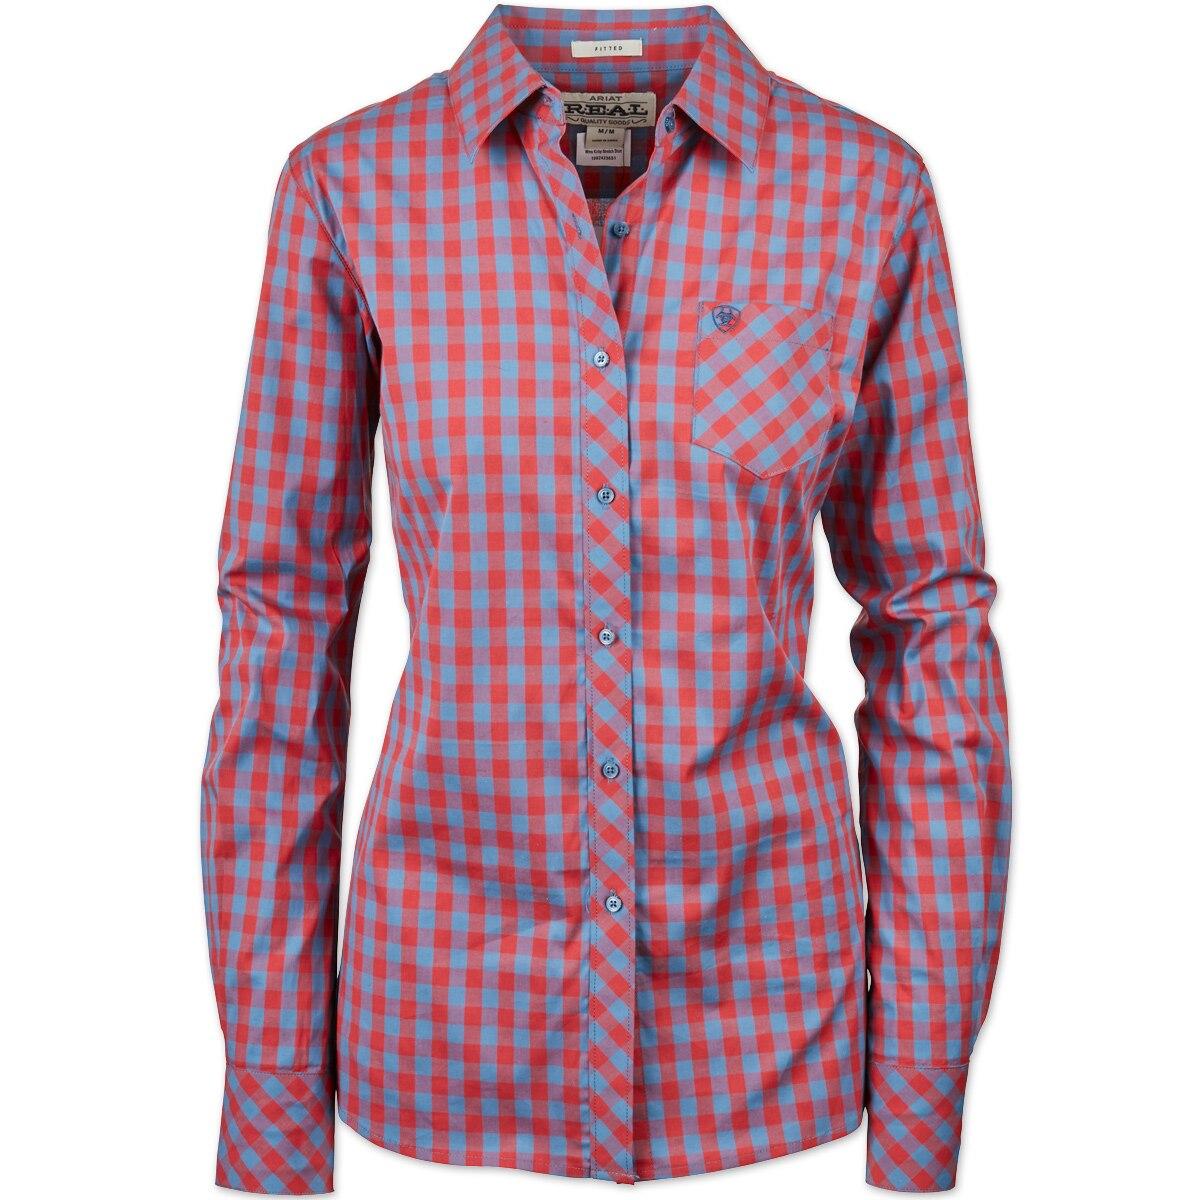 Ariat Women's R.E.A.L. Kirby Stretch Shirt Gingham